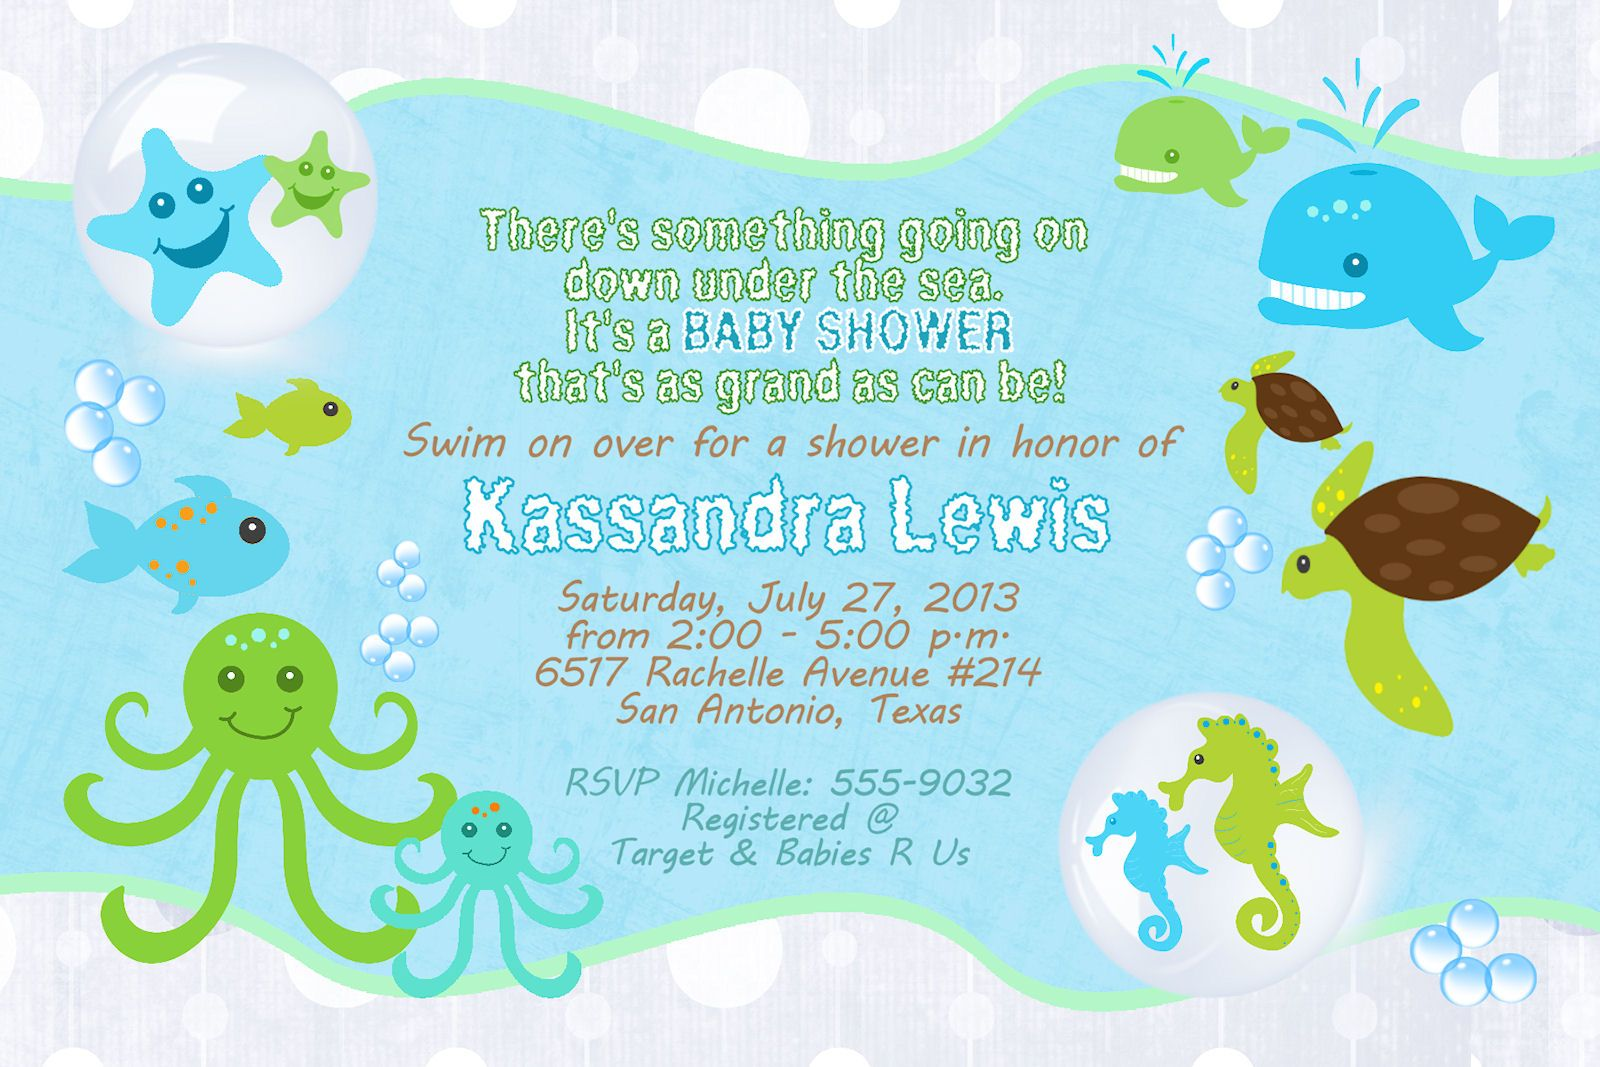 Ocean Baby Shower Invitations Under The Sea Turtle Seahorse Starfish